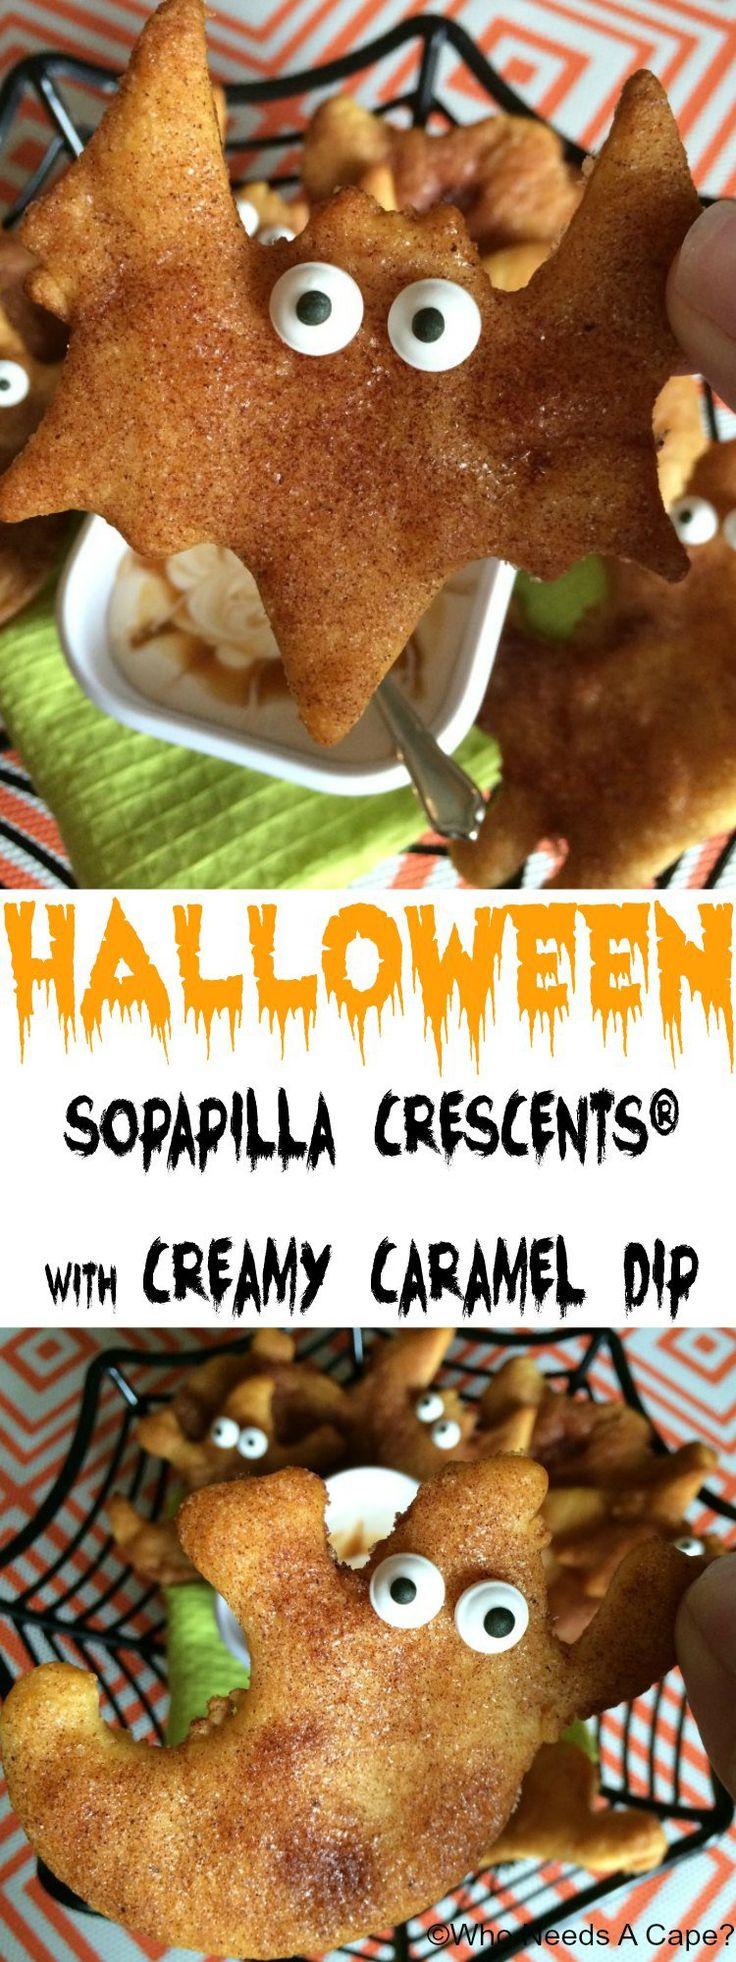 halloween sopapilla crescents with creamy caramel dip halloween partieshalloween snackshalloween funhalloween - Fun Halloween Party Snacks